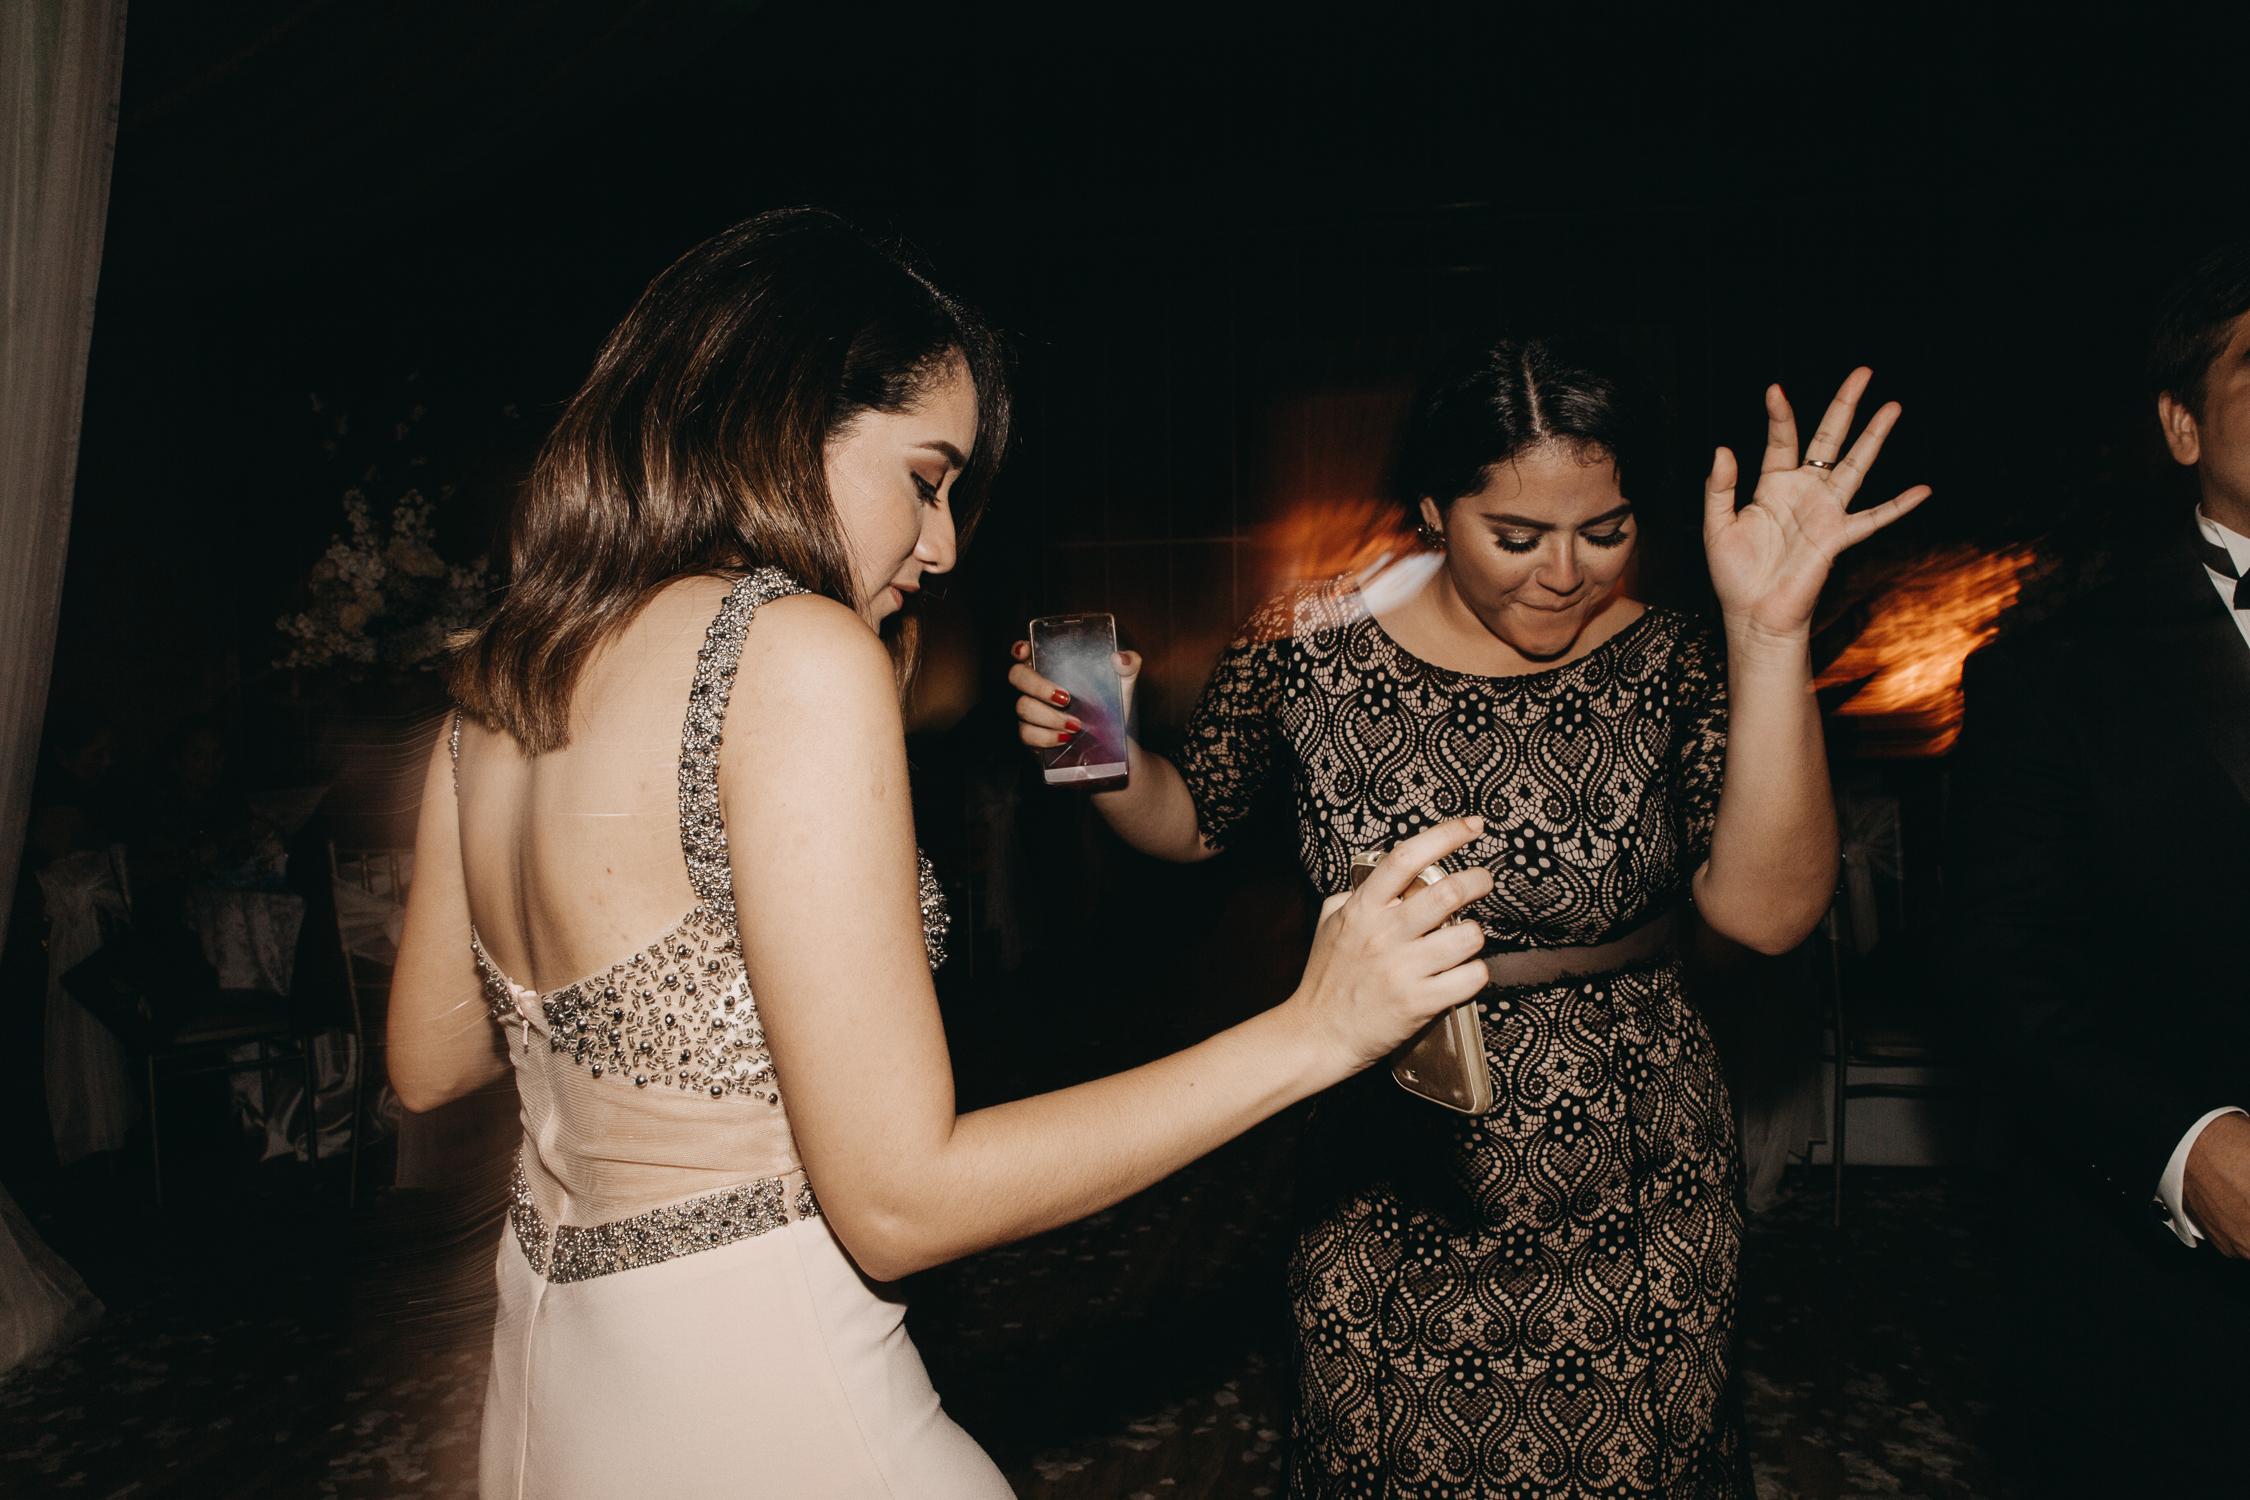 Michelle-Agurto-Fotografia-Bodas-Ecuador-Destination-Wedding-Photographer-Vicky-Javier-221.JPG